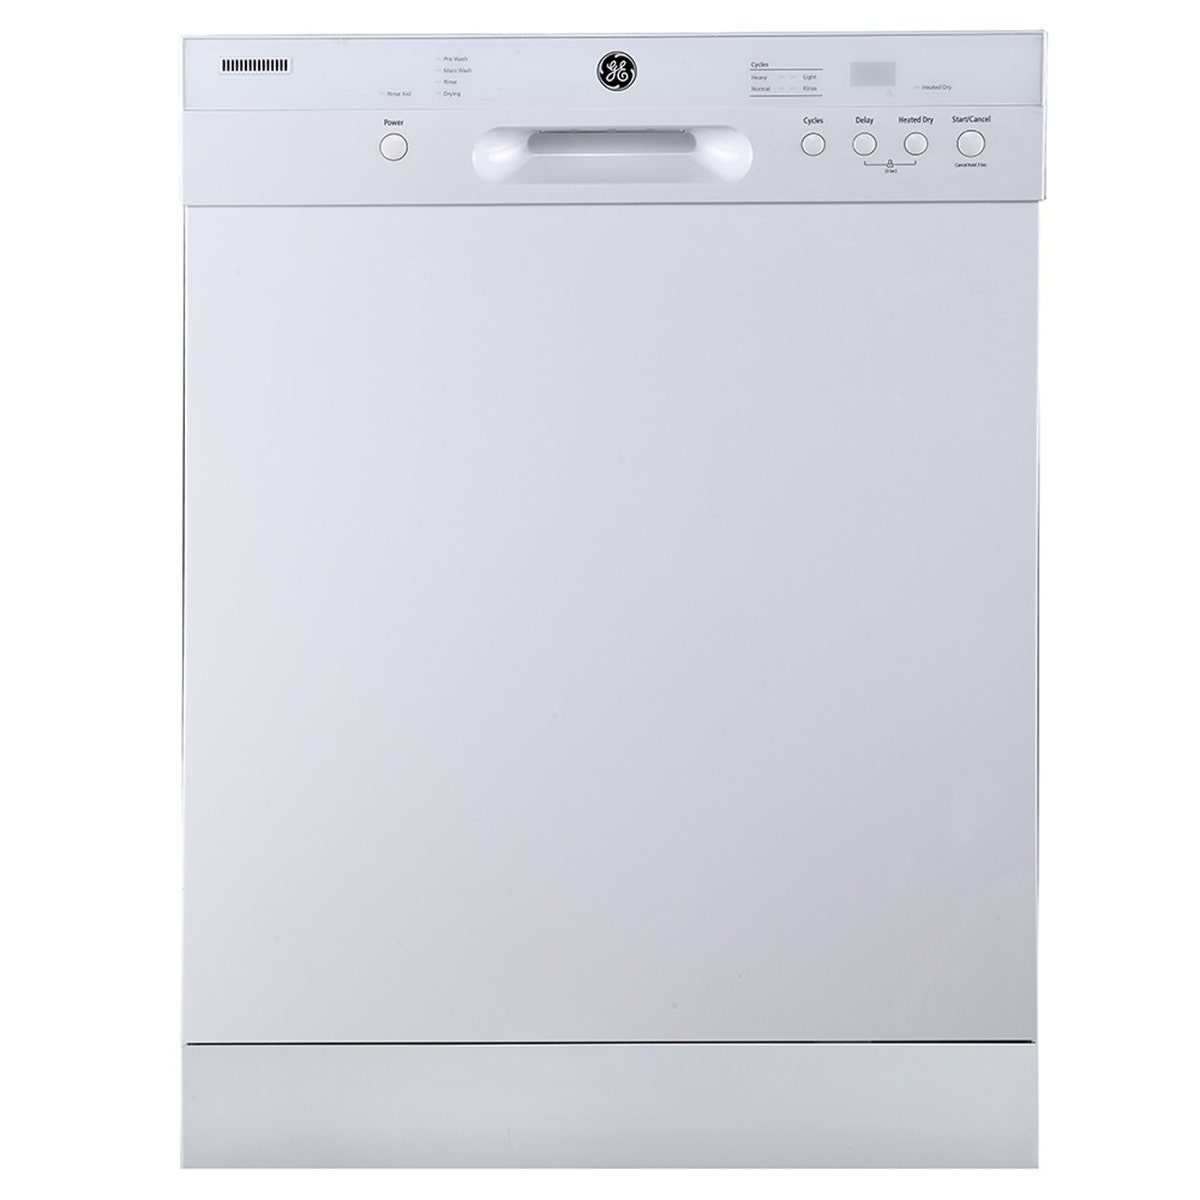 Lavaplatos General Electric GBF412SGMWWX color blanco